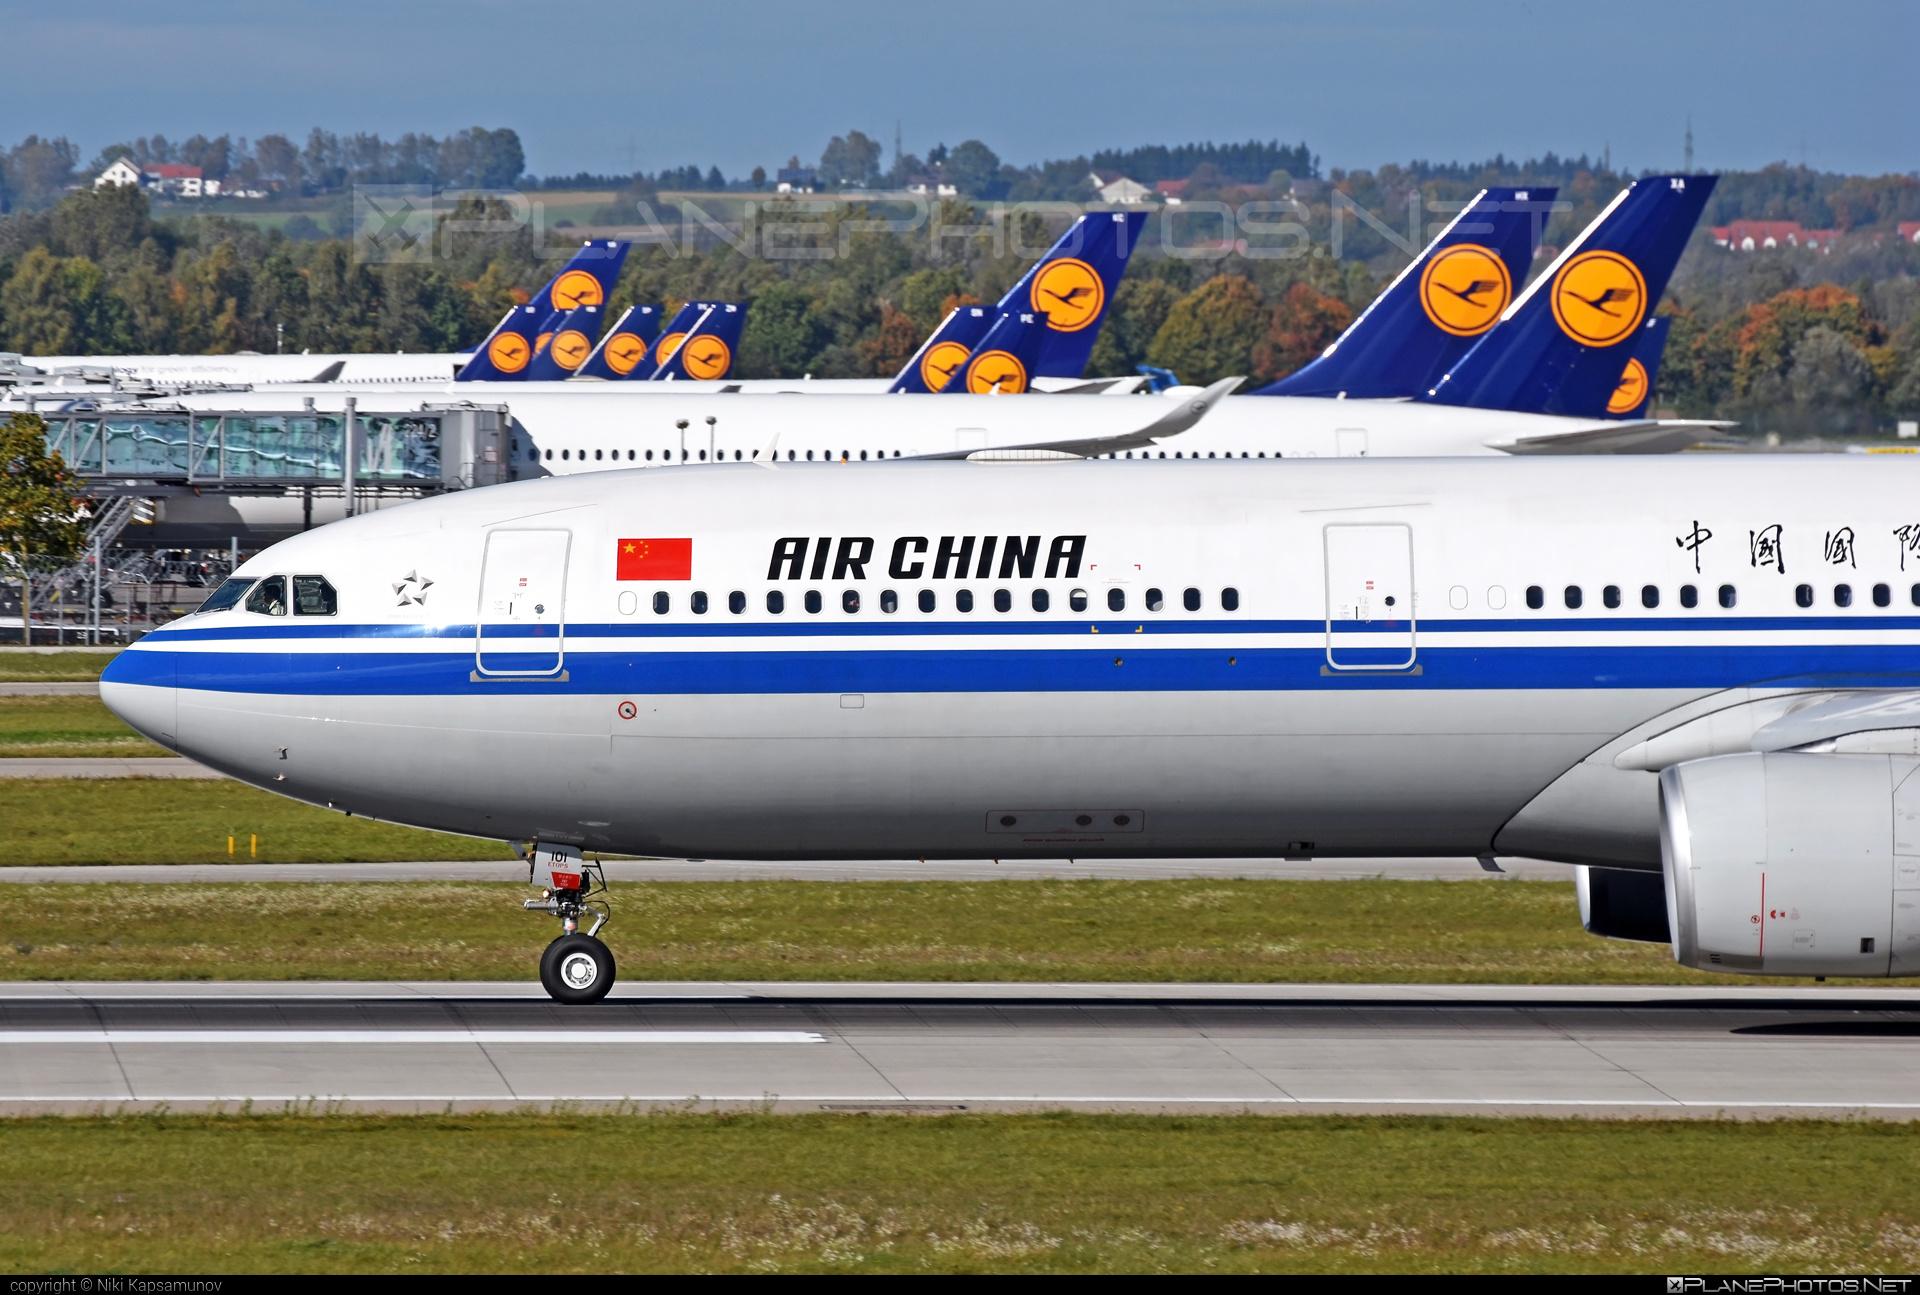 Airbus A330-343E - B-6101 operated by Air China #a330 #a330e #a330family #airbus #airbus330 #airchina